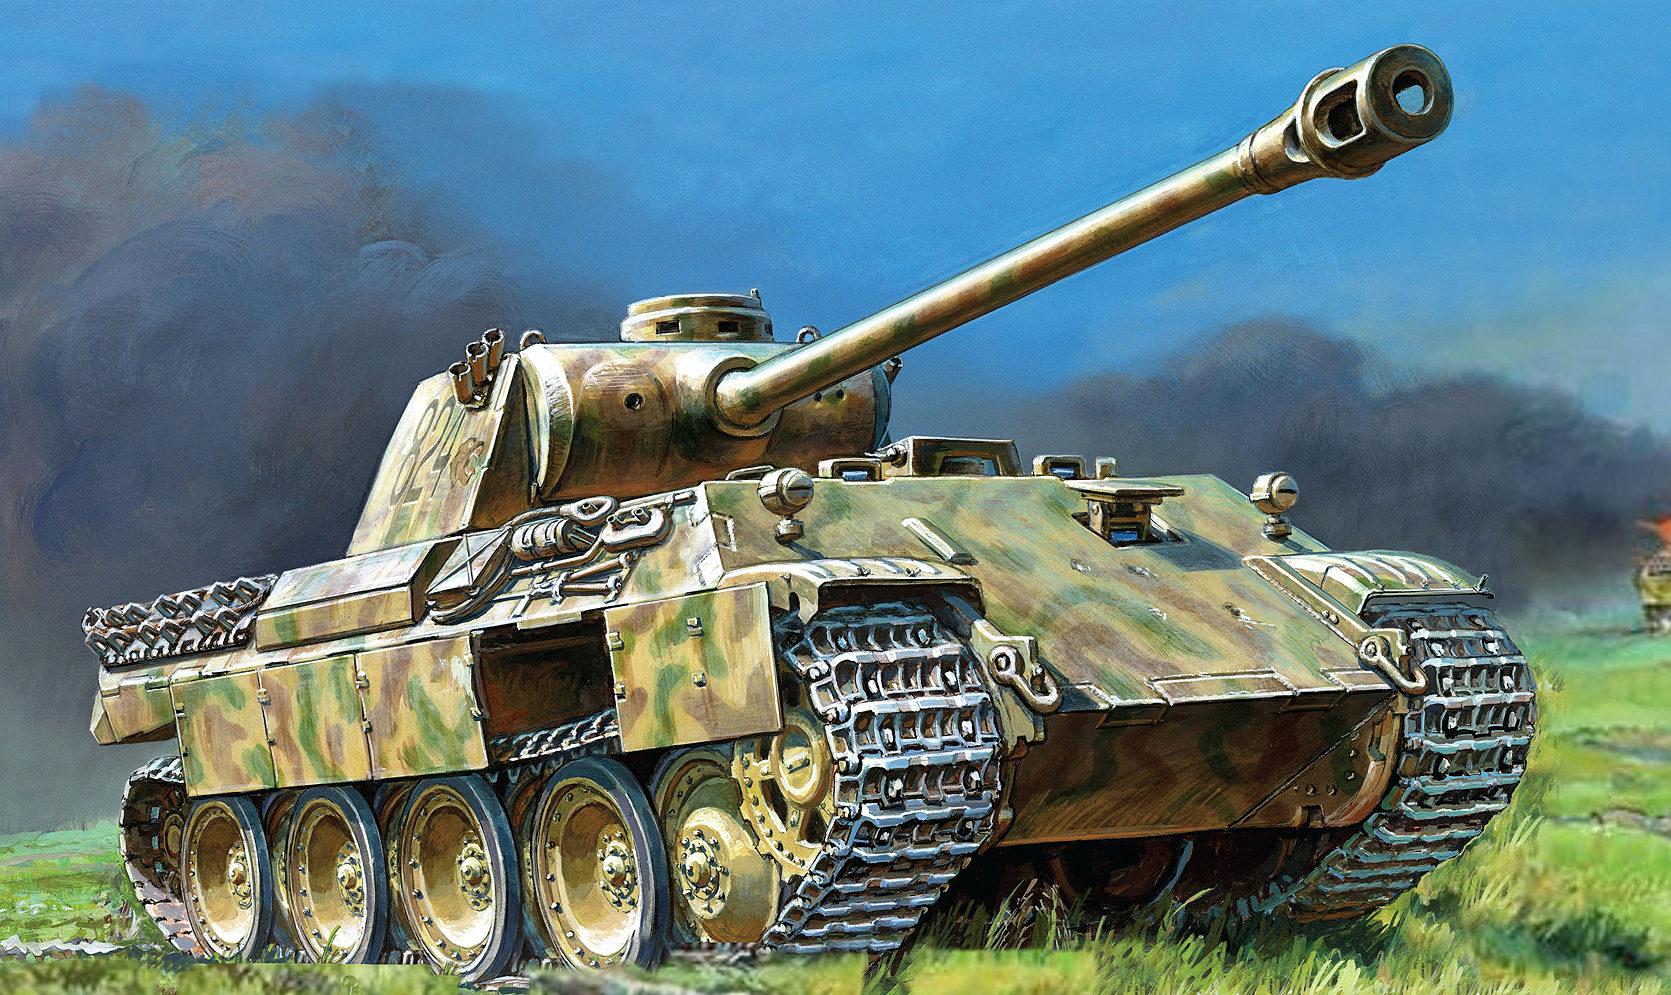 Жирнов Андрей. Танк Pz.Kpfw. V Ausf A.